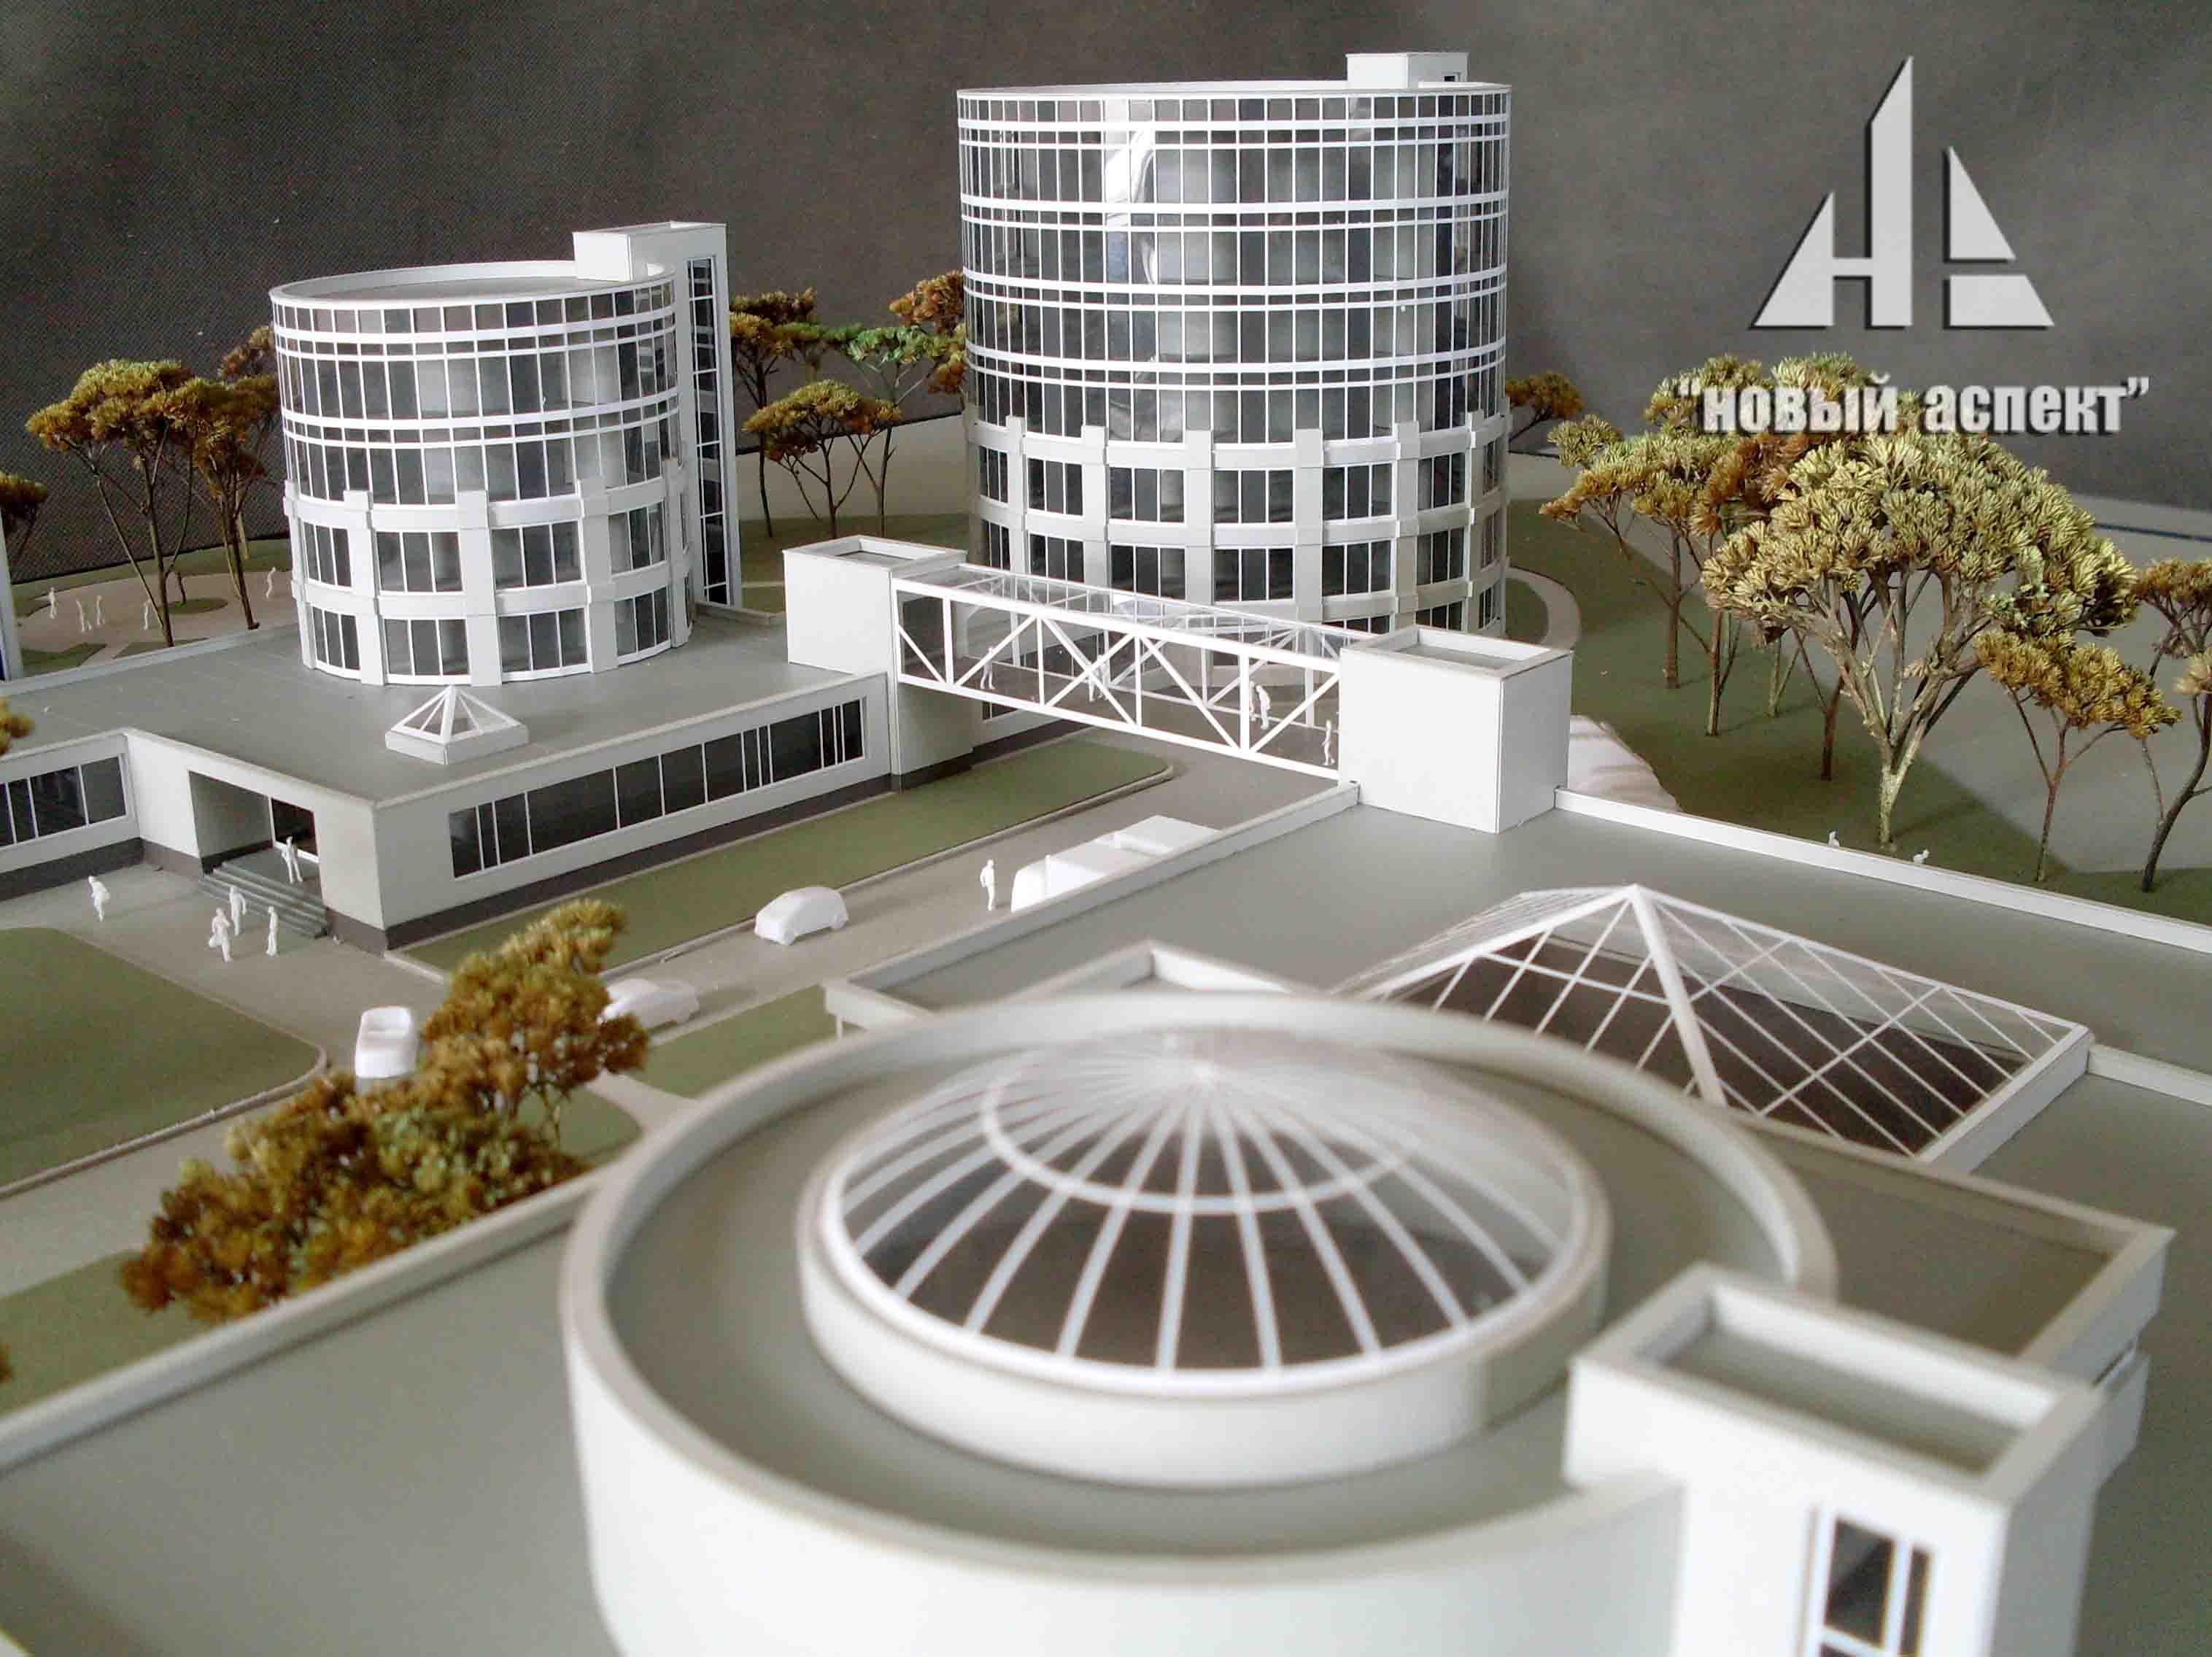 Макеты общественных зданий Медцентр (3)